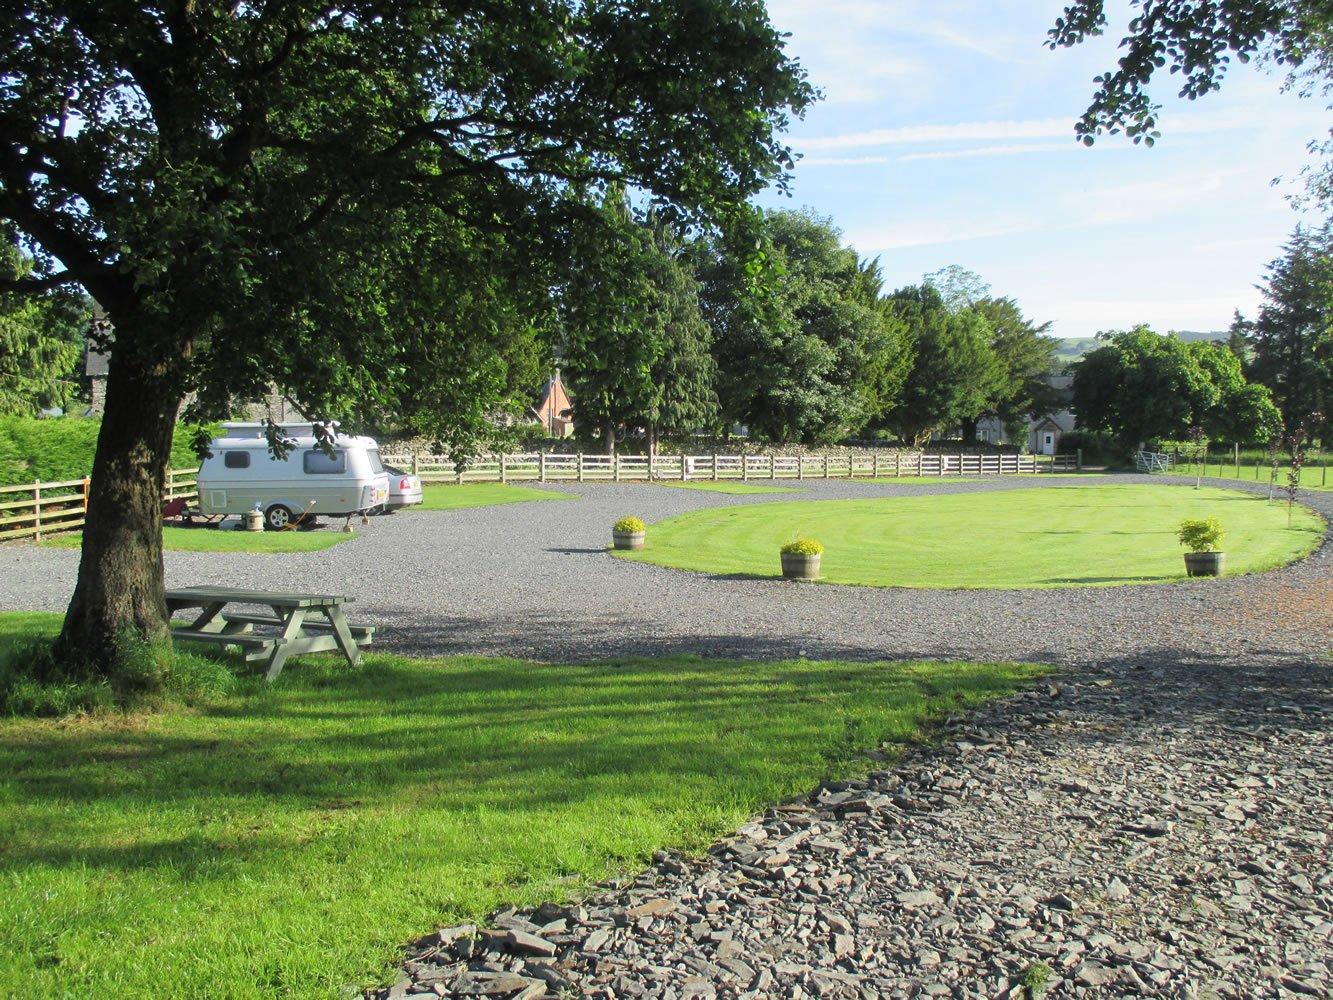 North Wales caravan site with excellent facilities